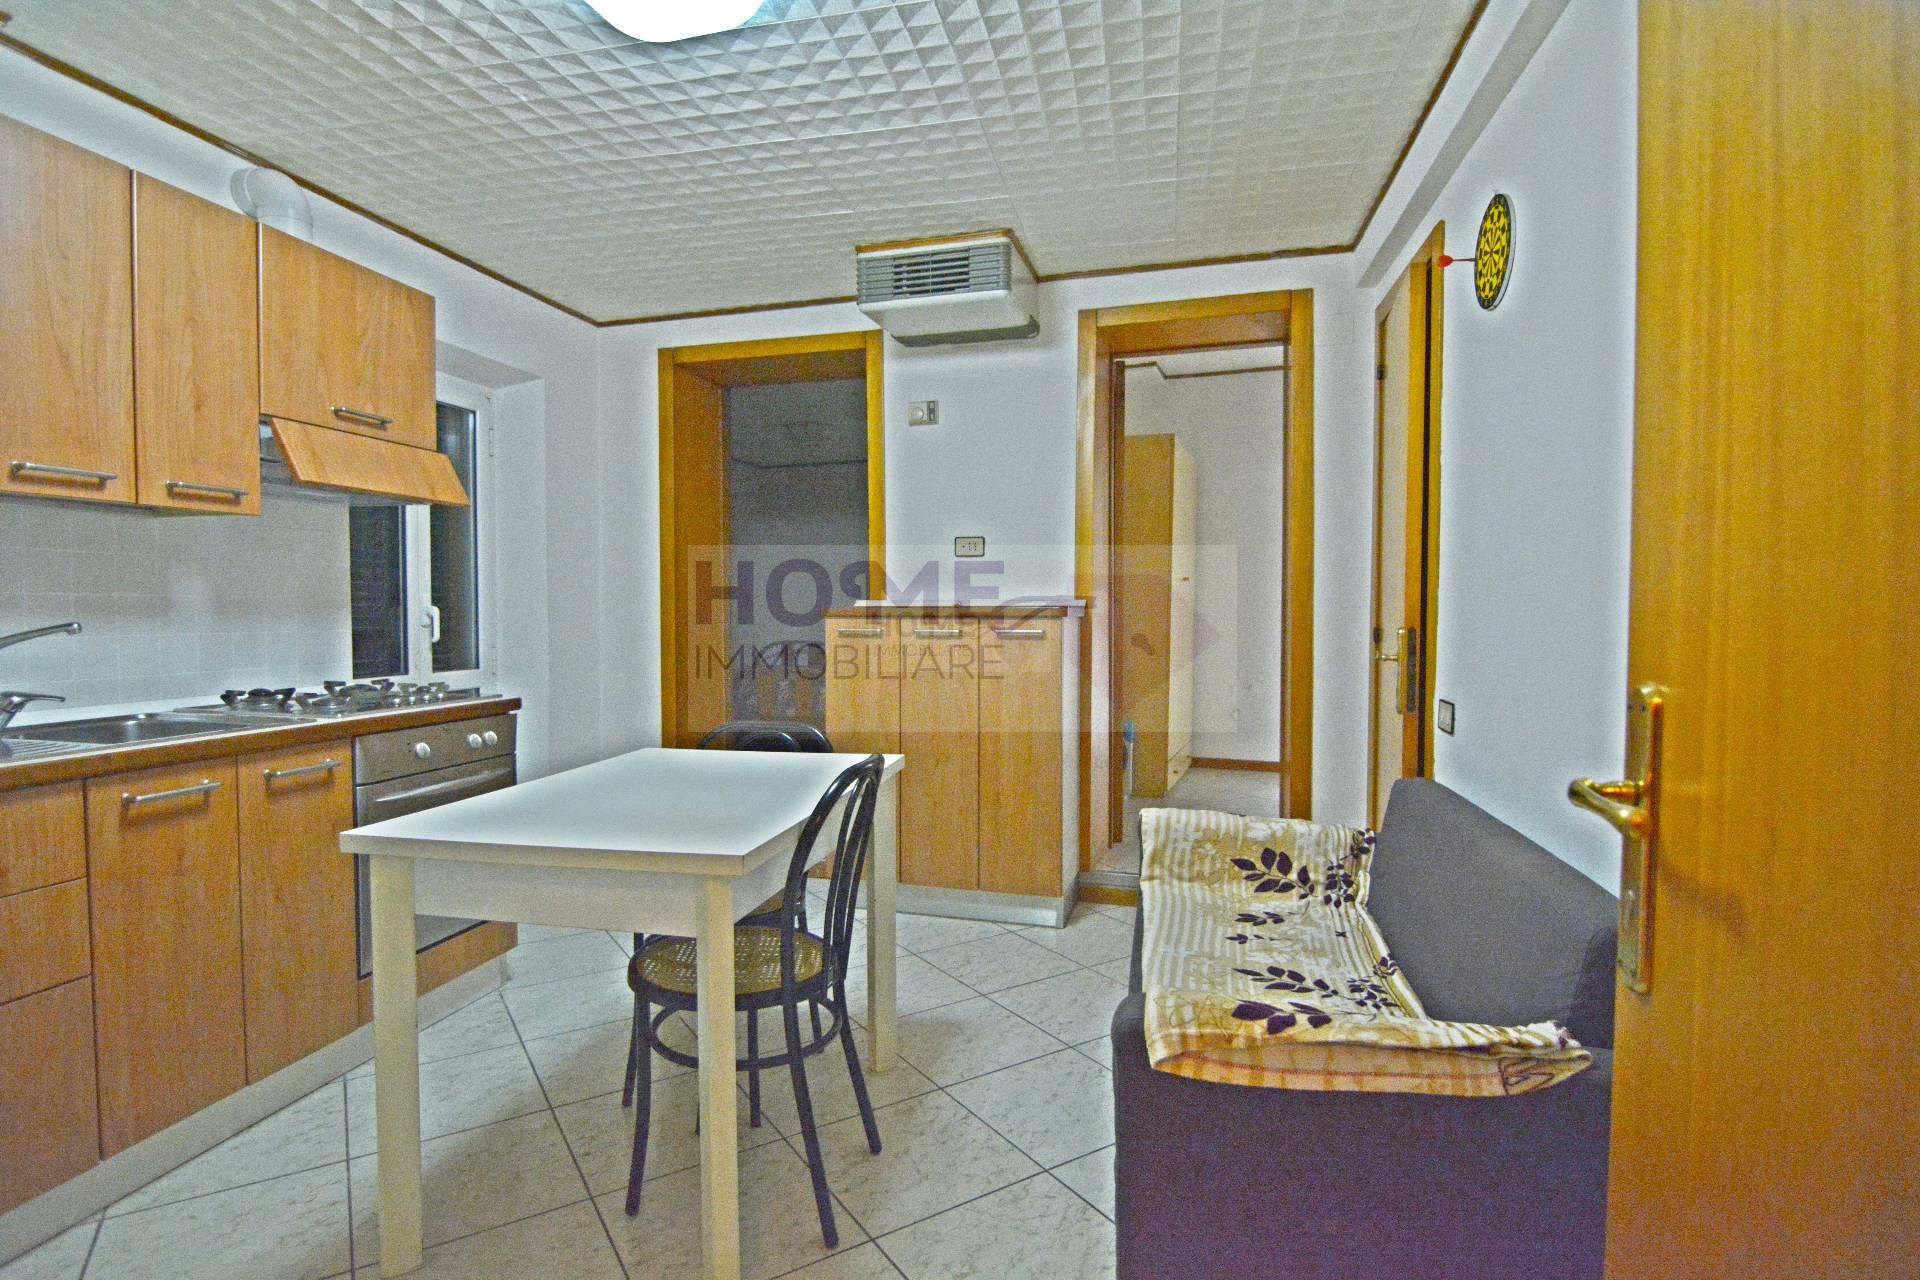 Appartamento, 50 Mq, Affitto - Macerata (Macerata)